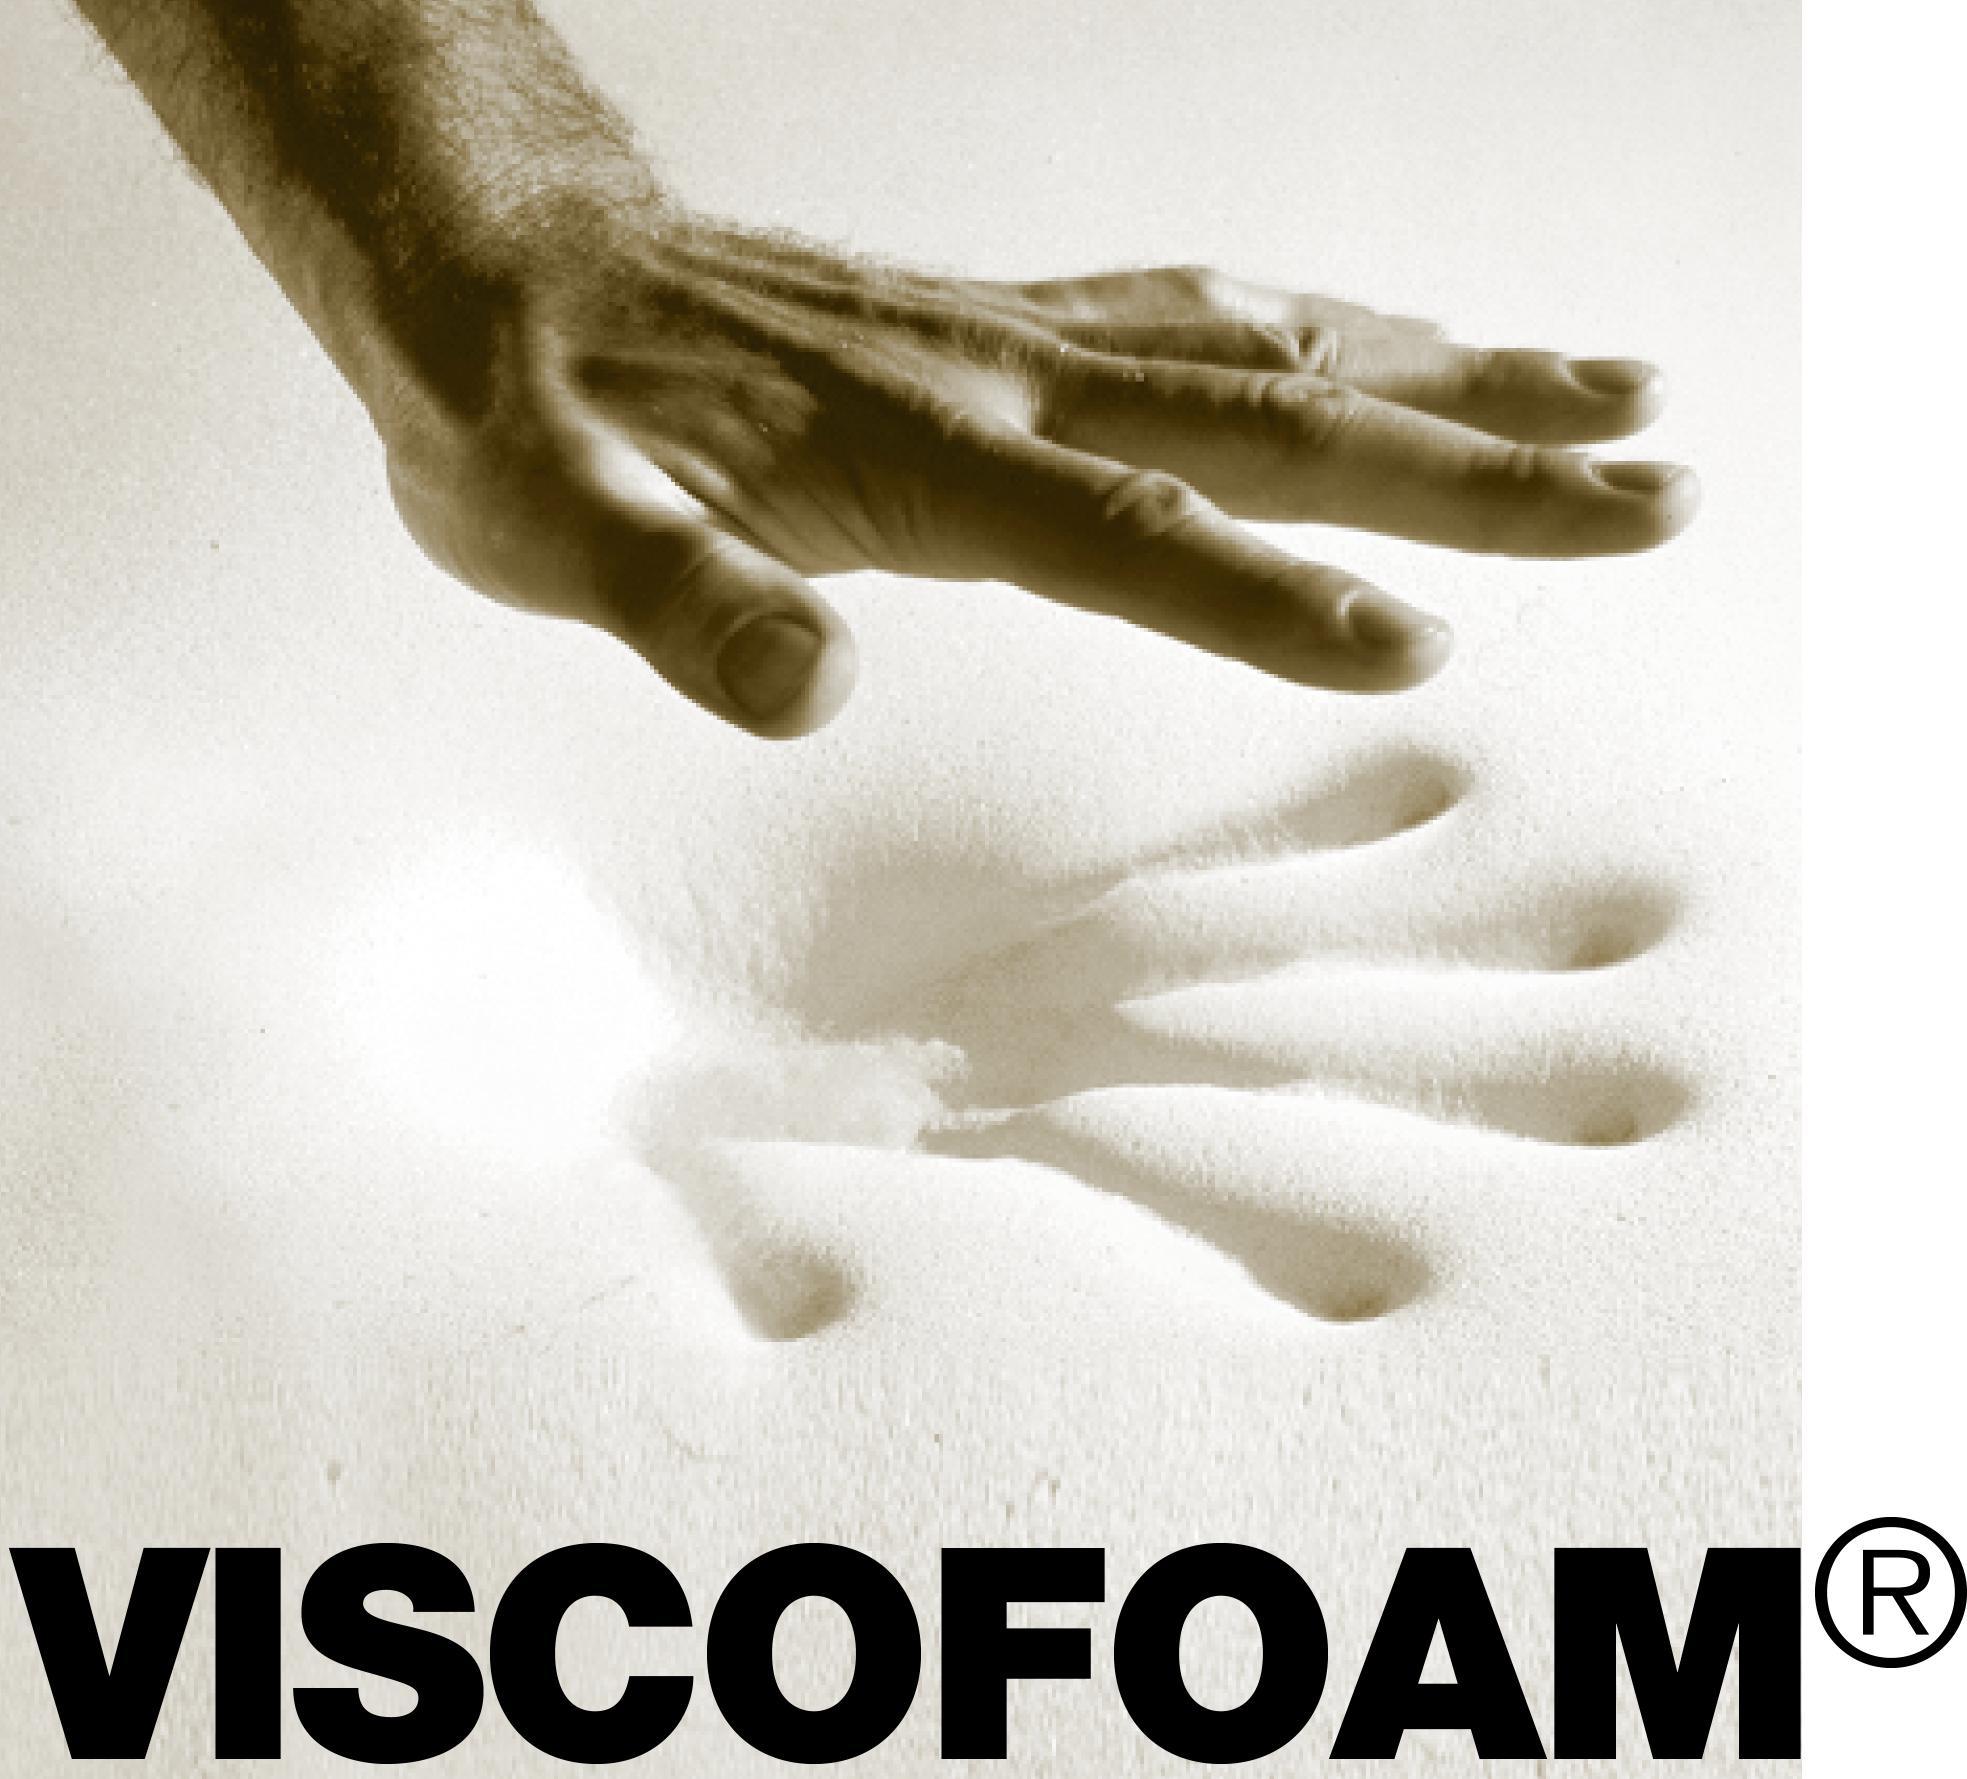 viscofoam